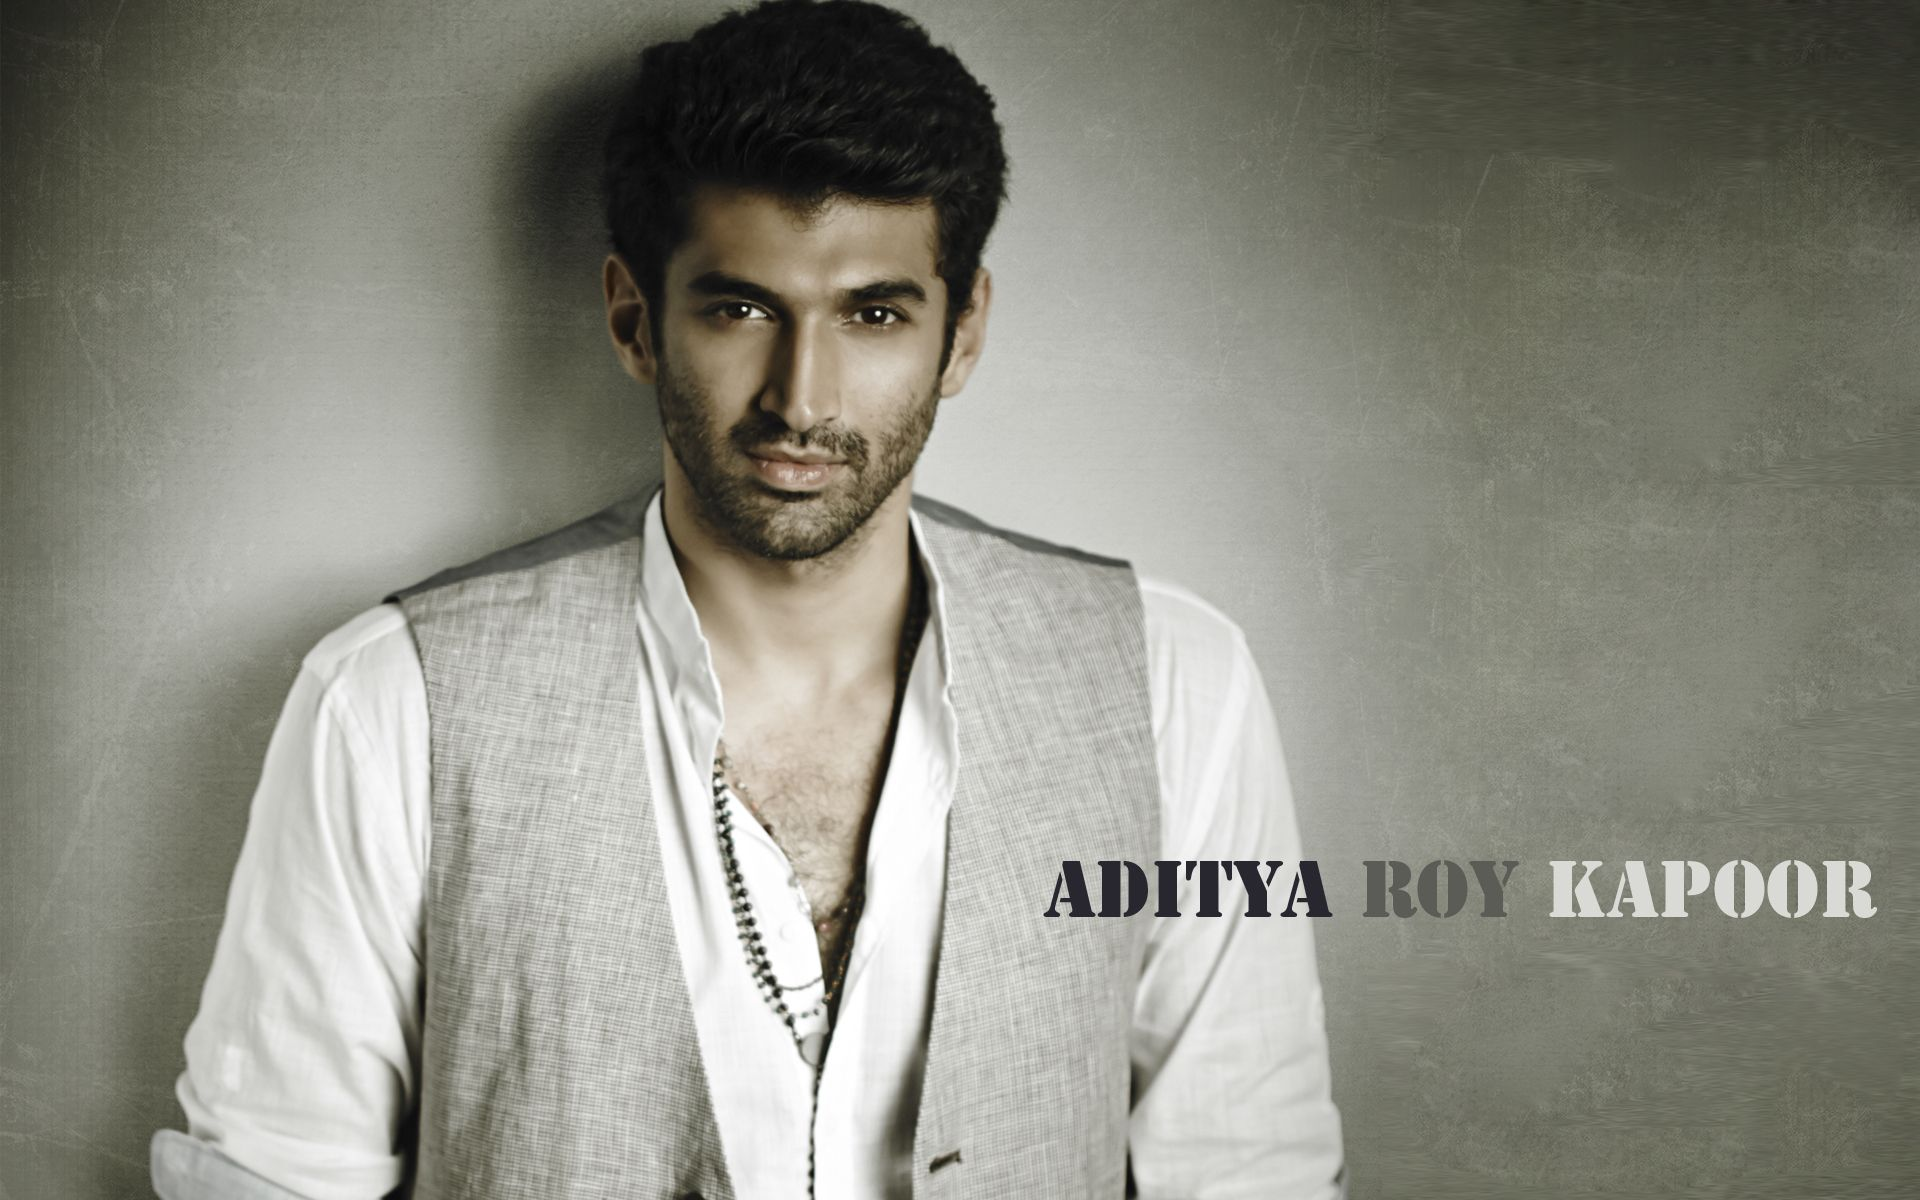 Aditya roy hd wallpaper